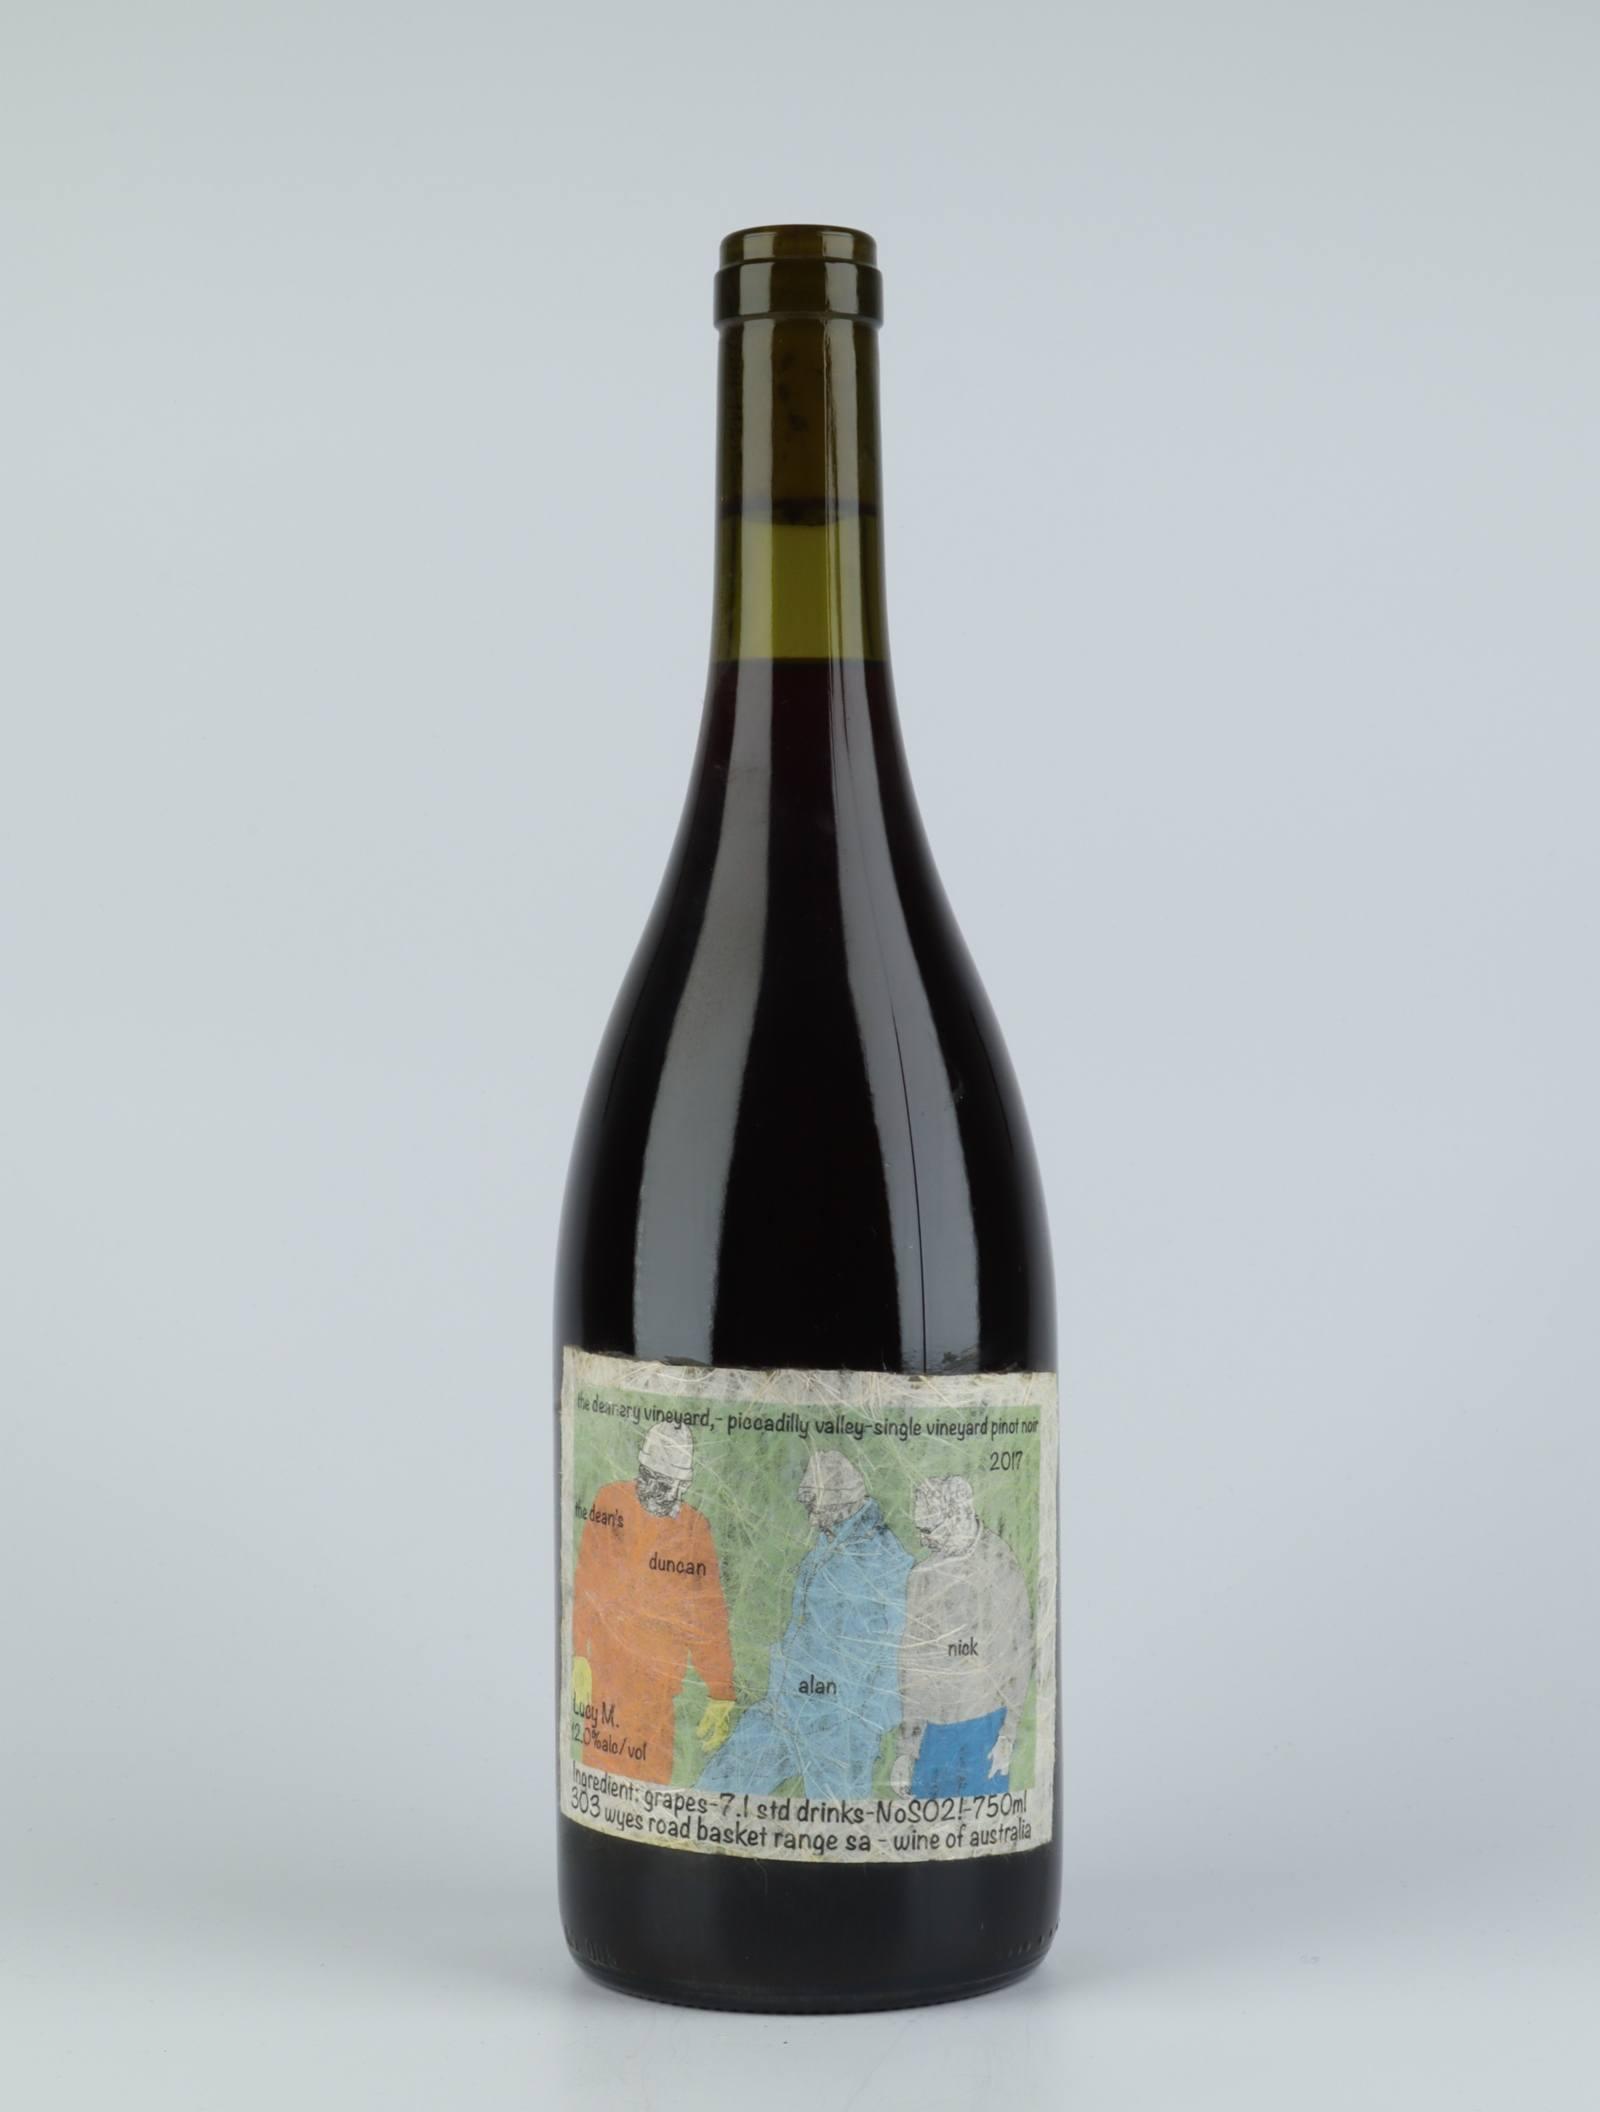 The Deanery Vineyard